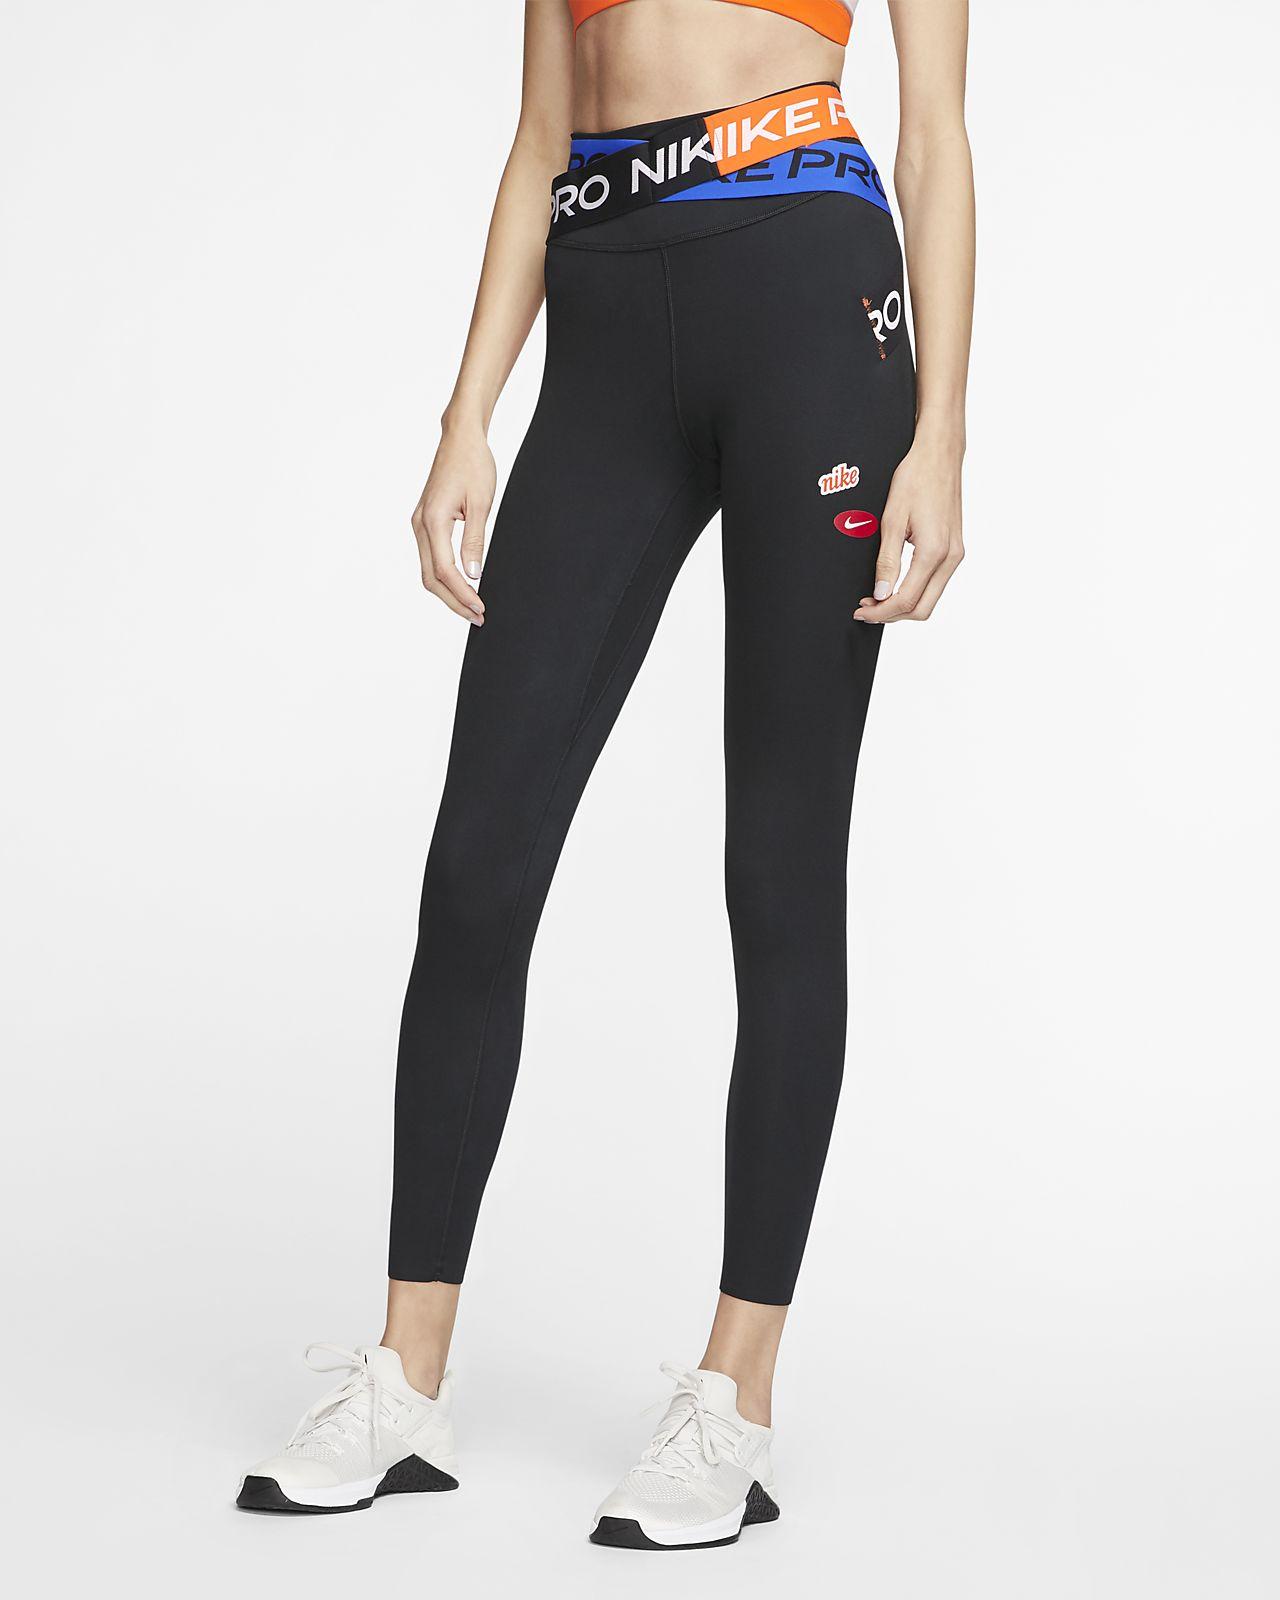 Nike One Luxe Icon Clash Women's Leggings